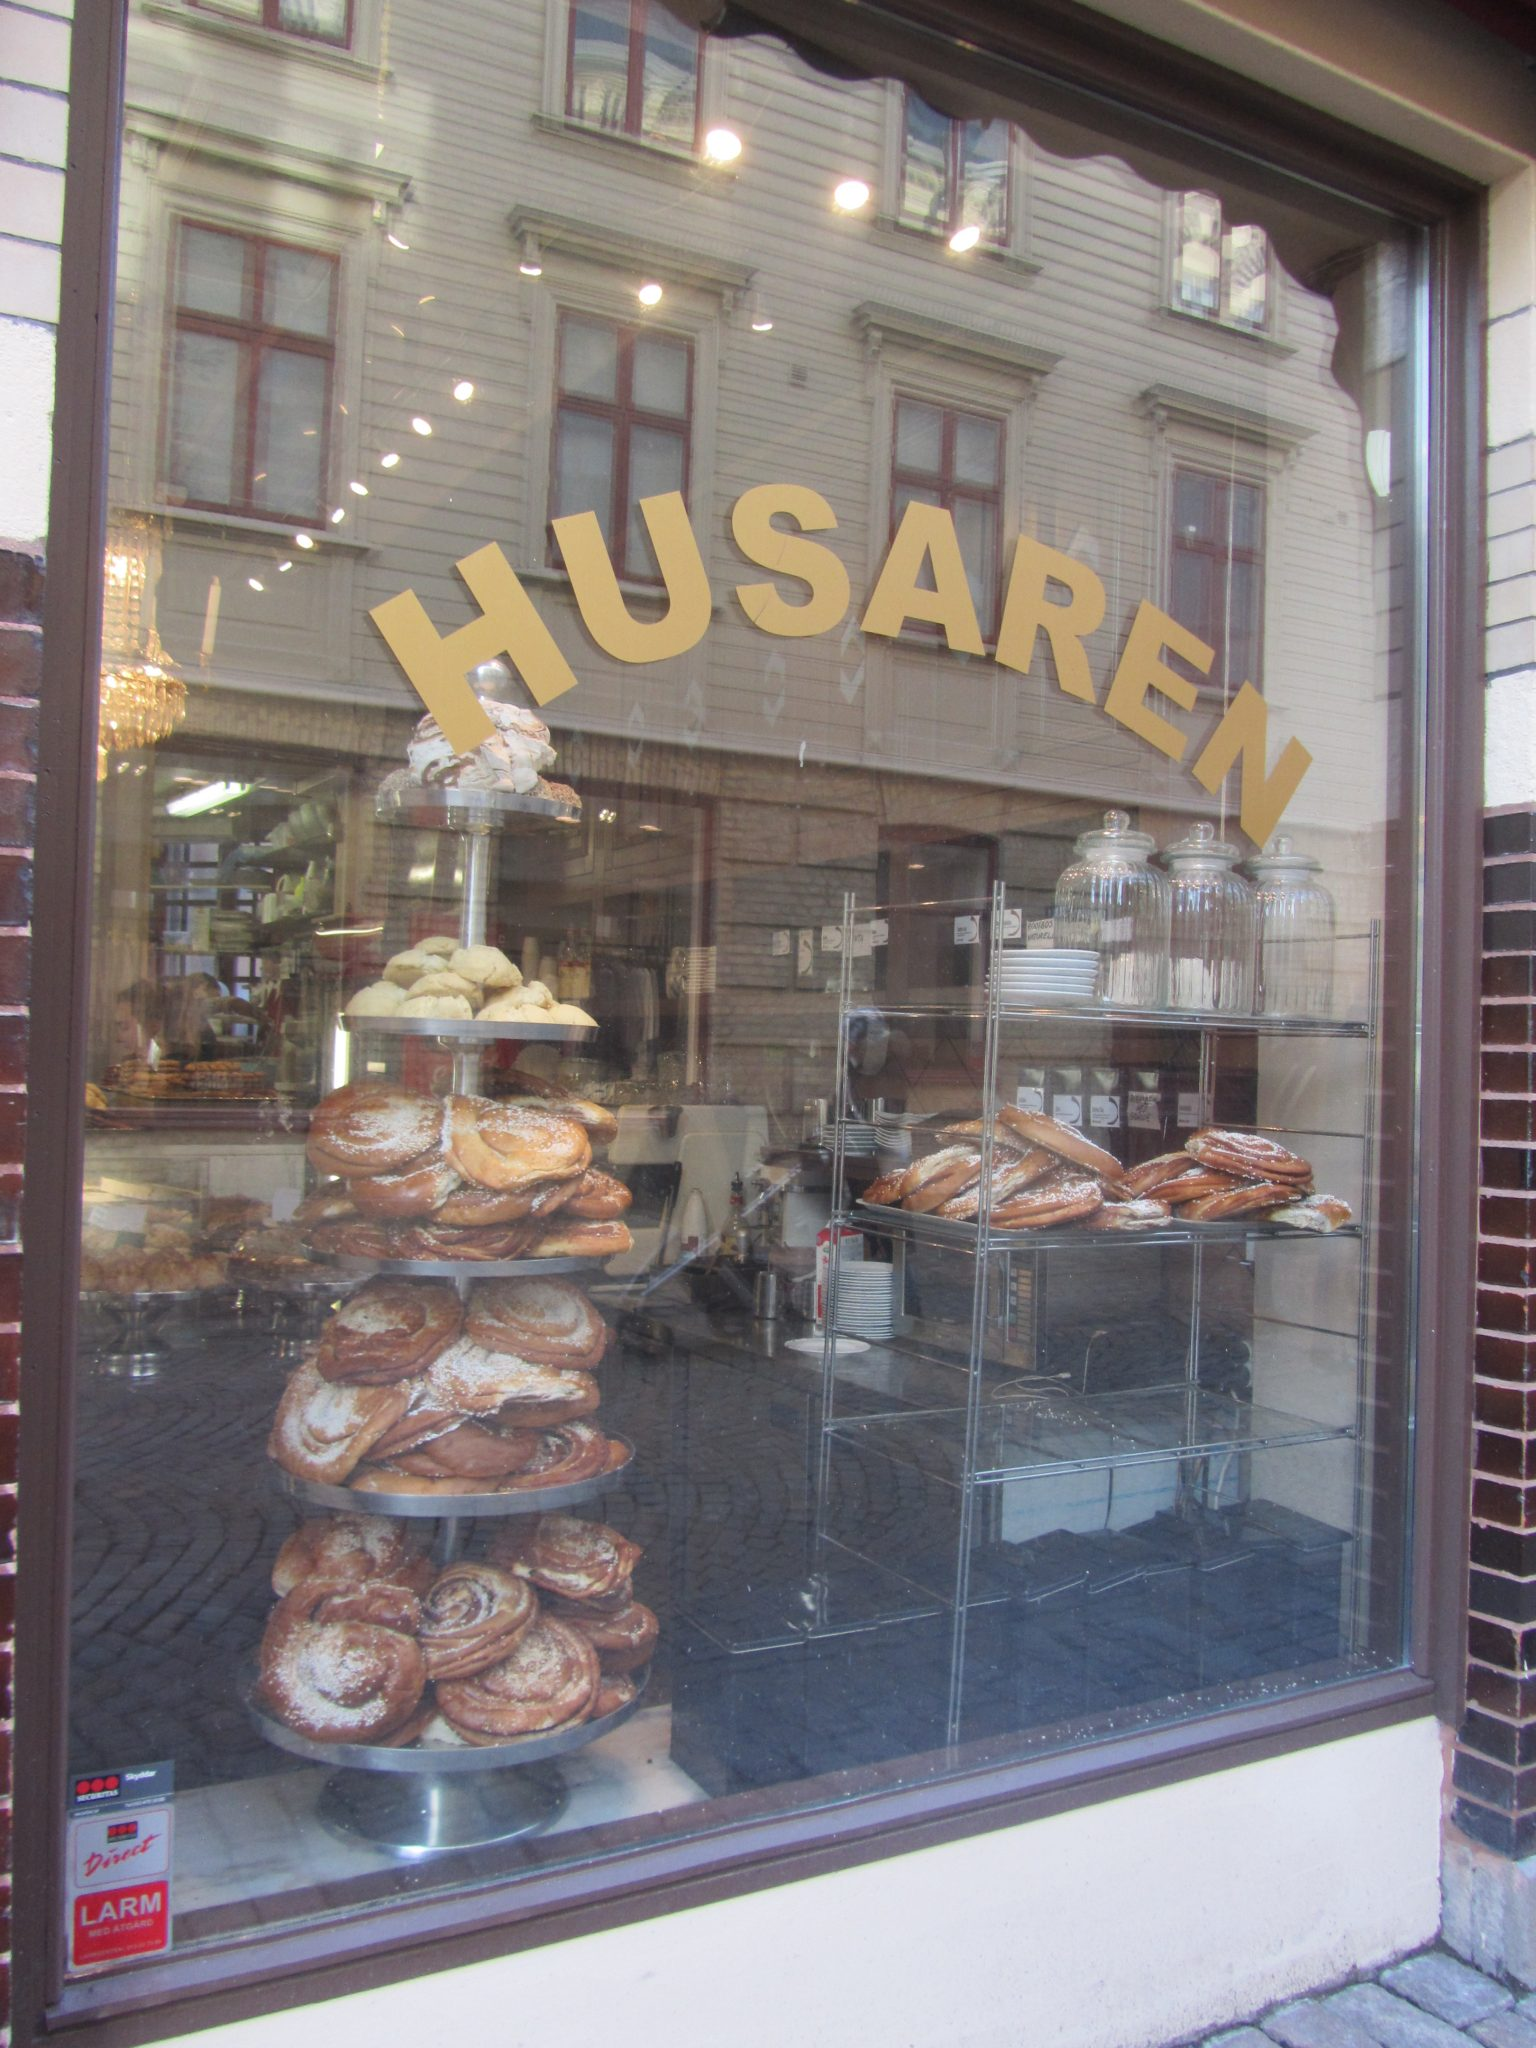 Cinnamon buns in Haga, Gothenburg